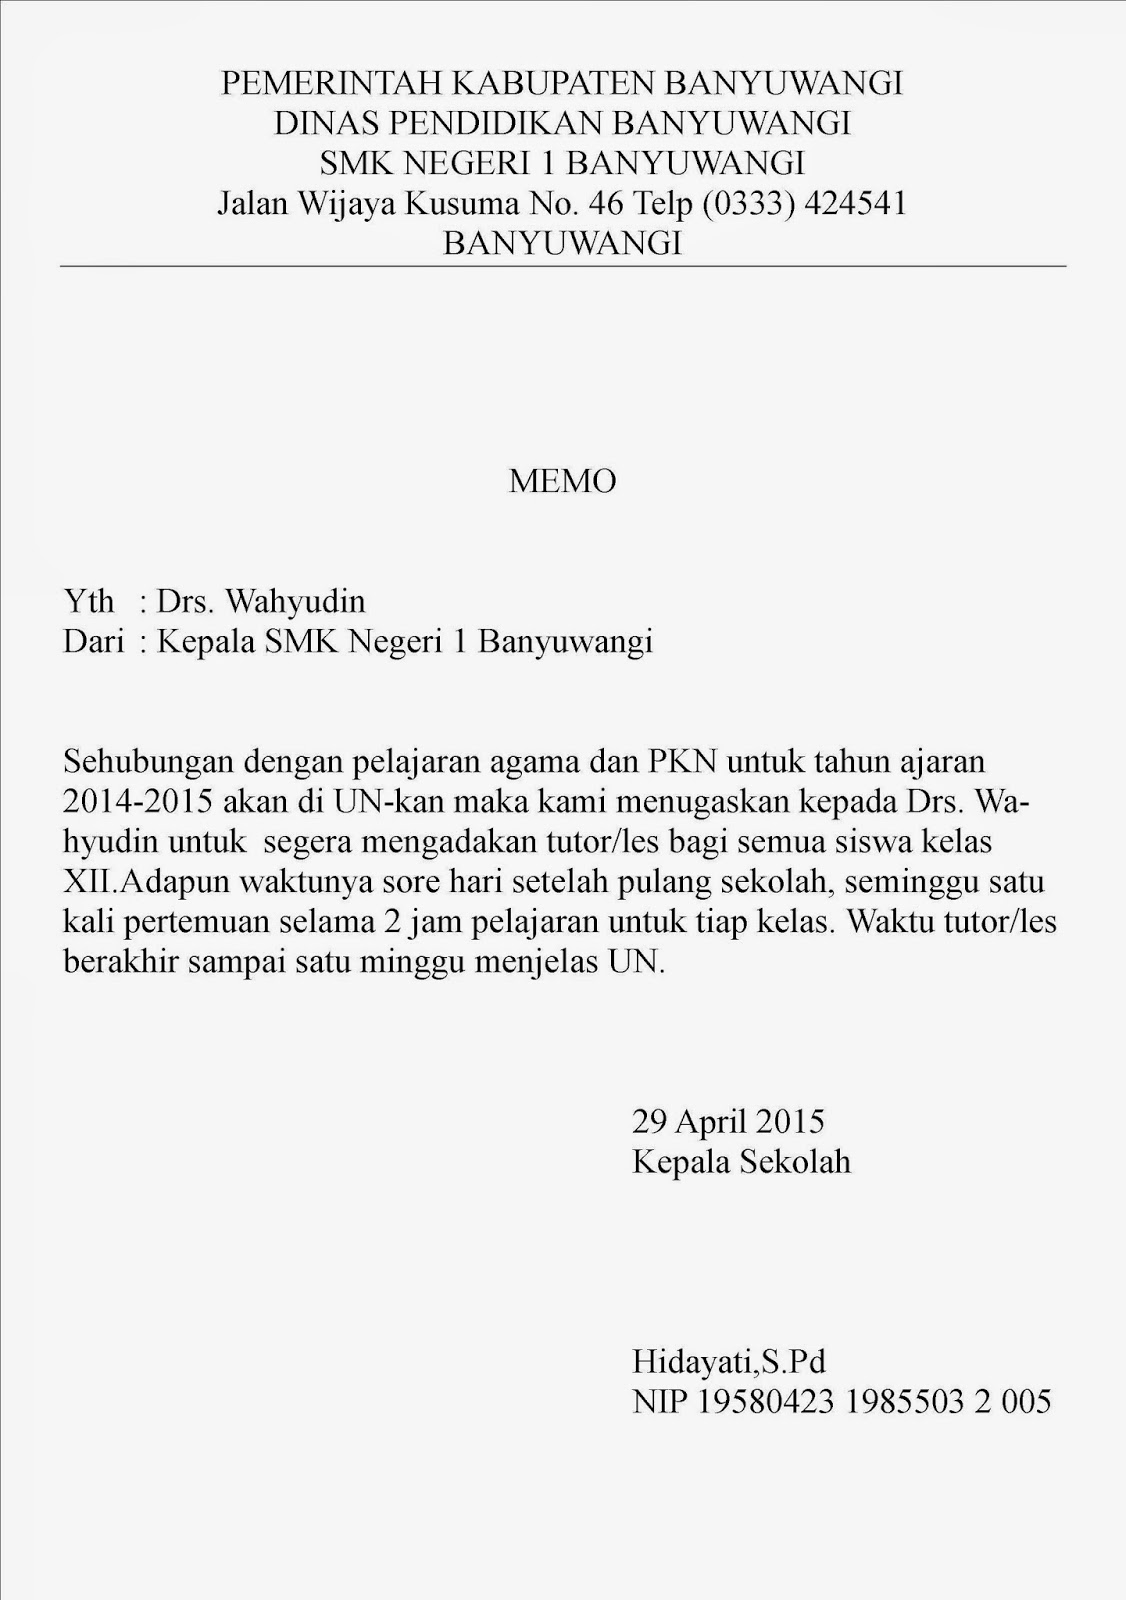 Contoh Surat Memorandum Dan Nota Dinas